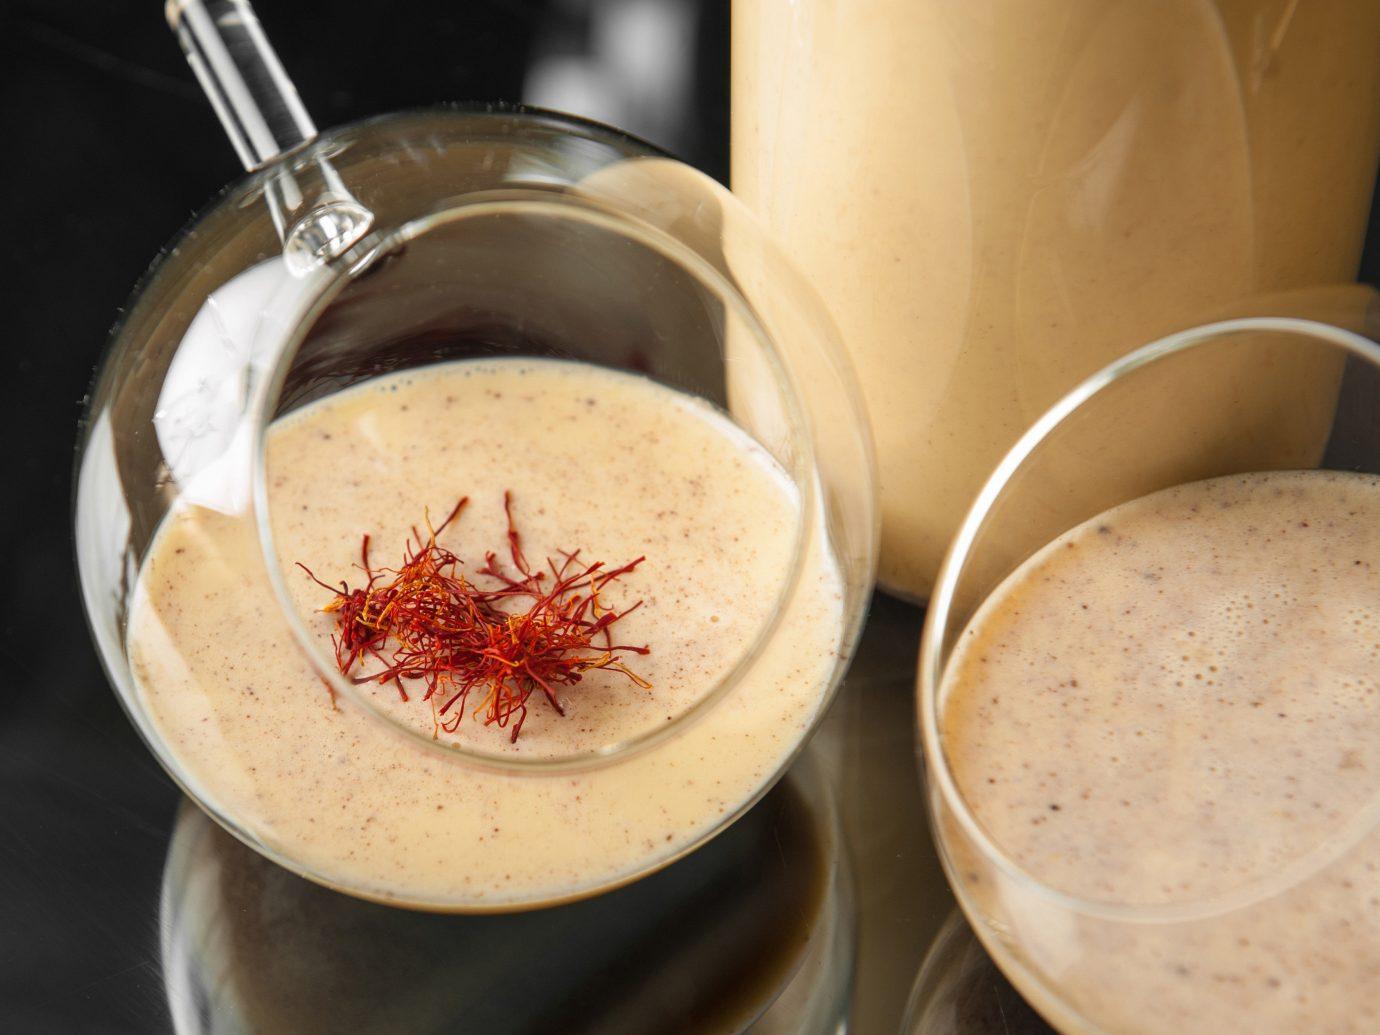 Food + Drink food plate cup indoor Drink dish produce flavor masala chai